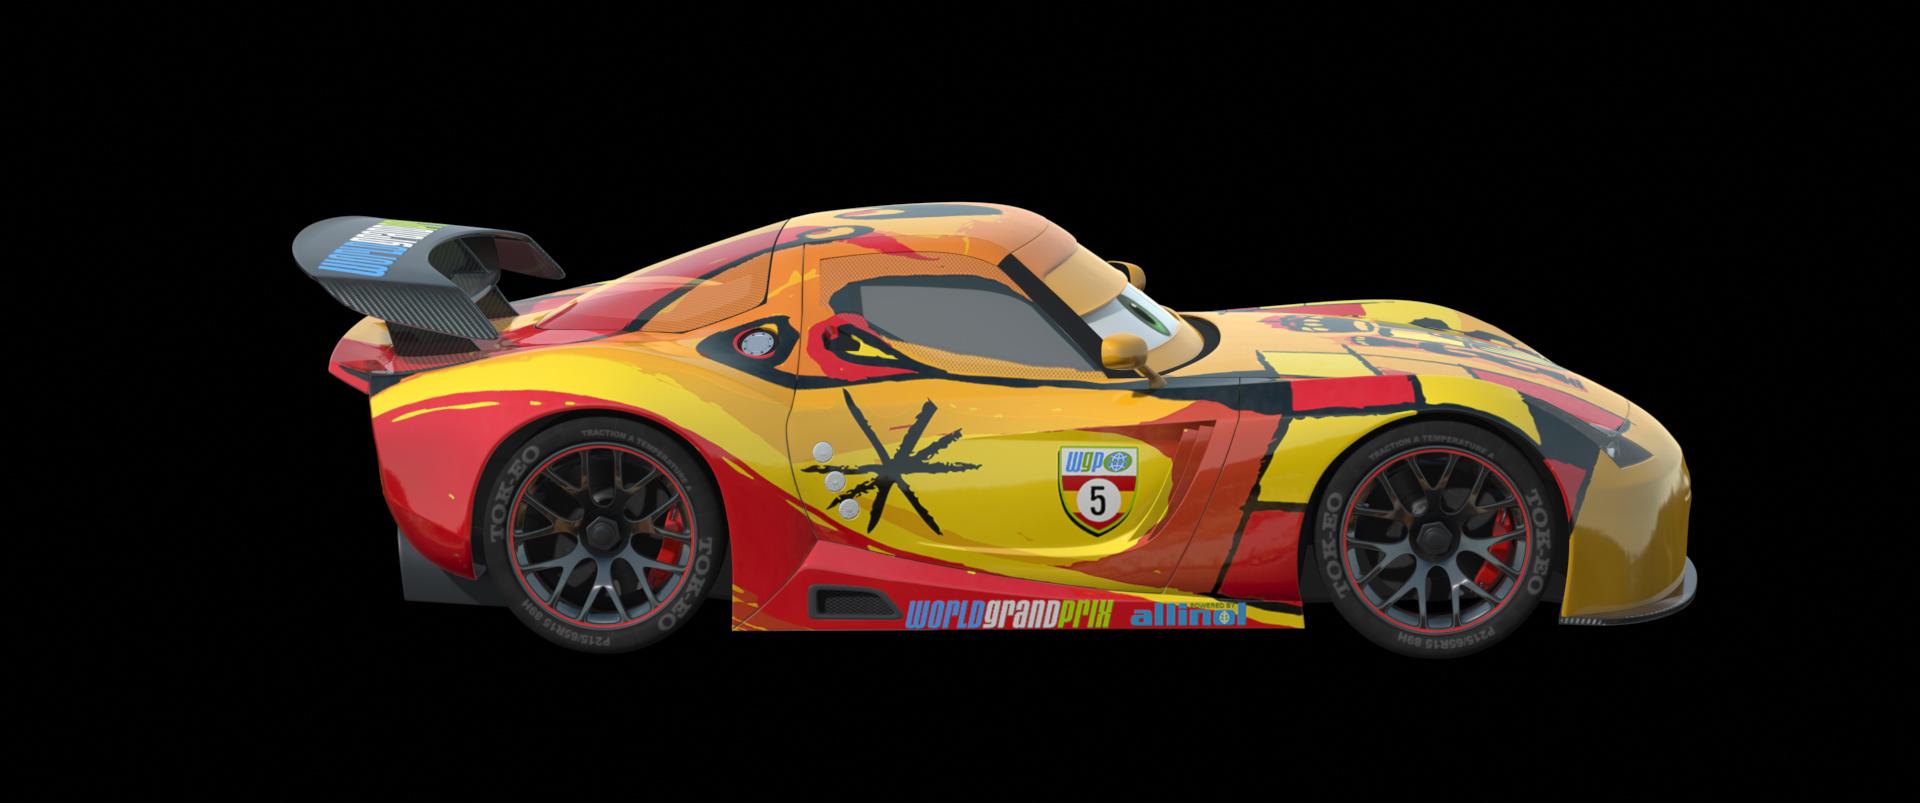 Disney Cars 2 And Real 1 1 Car Counterparts Disney Pixar